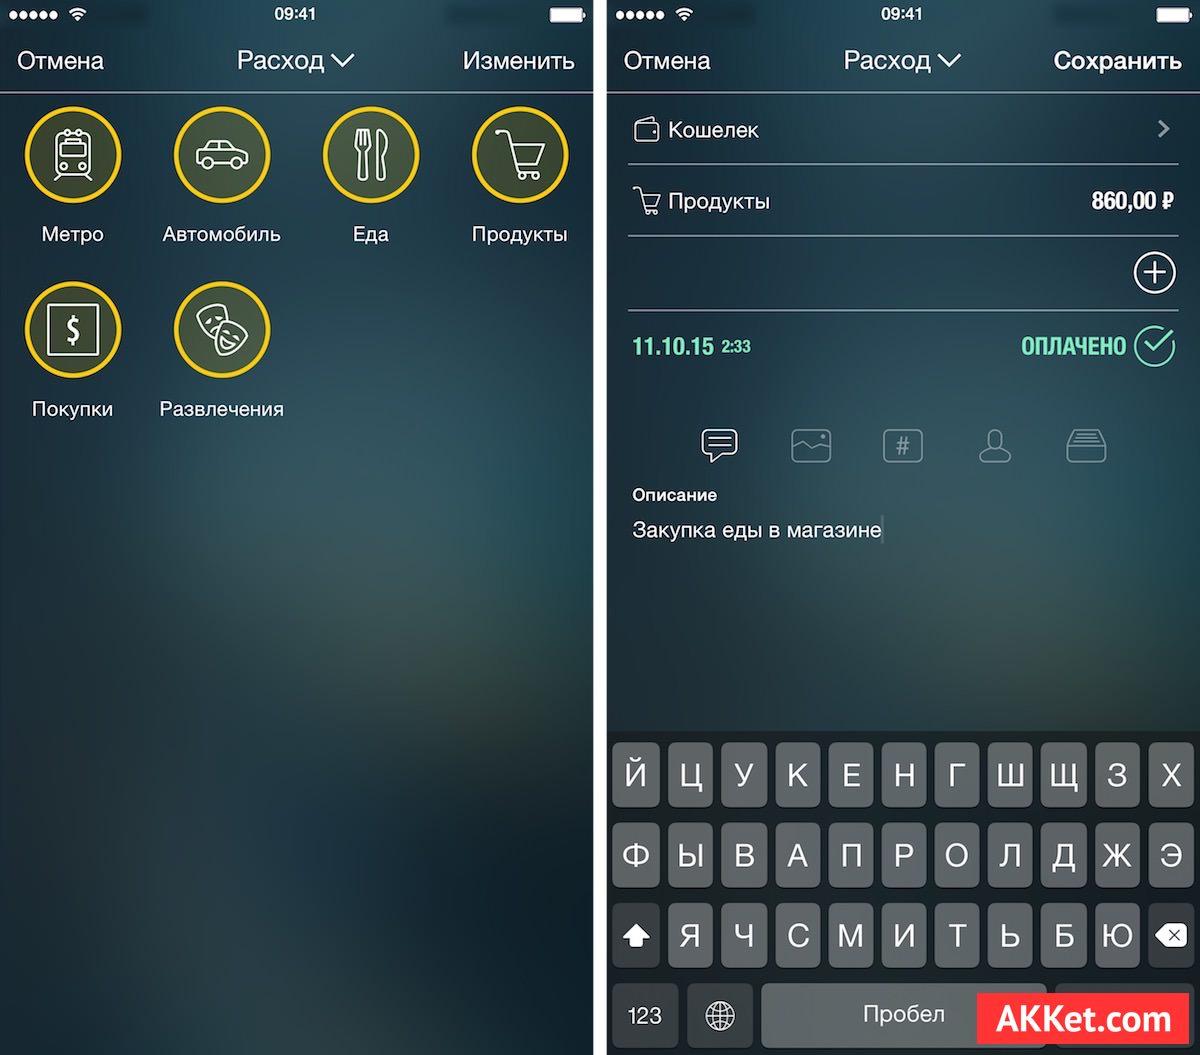 Money Pro akket.com review iOS os x mac iPhone iPad macbook imac pro iPhone 6s plus app store